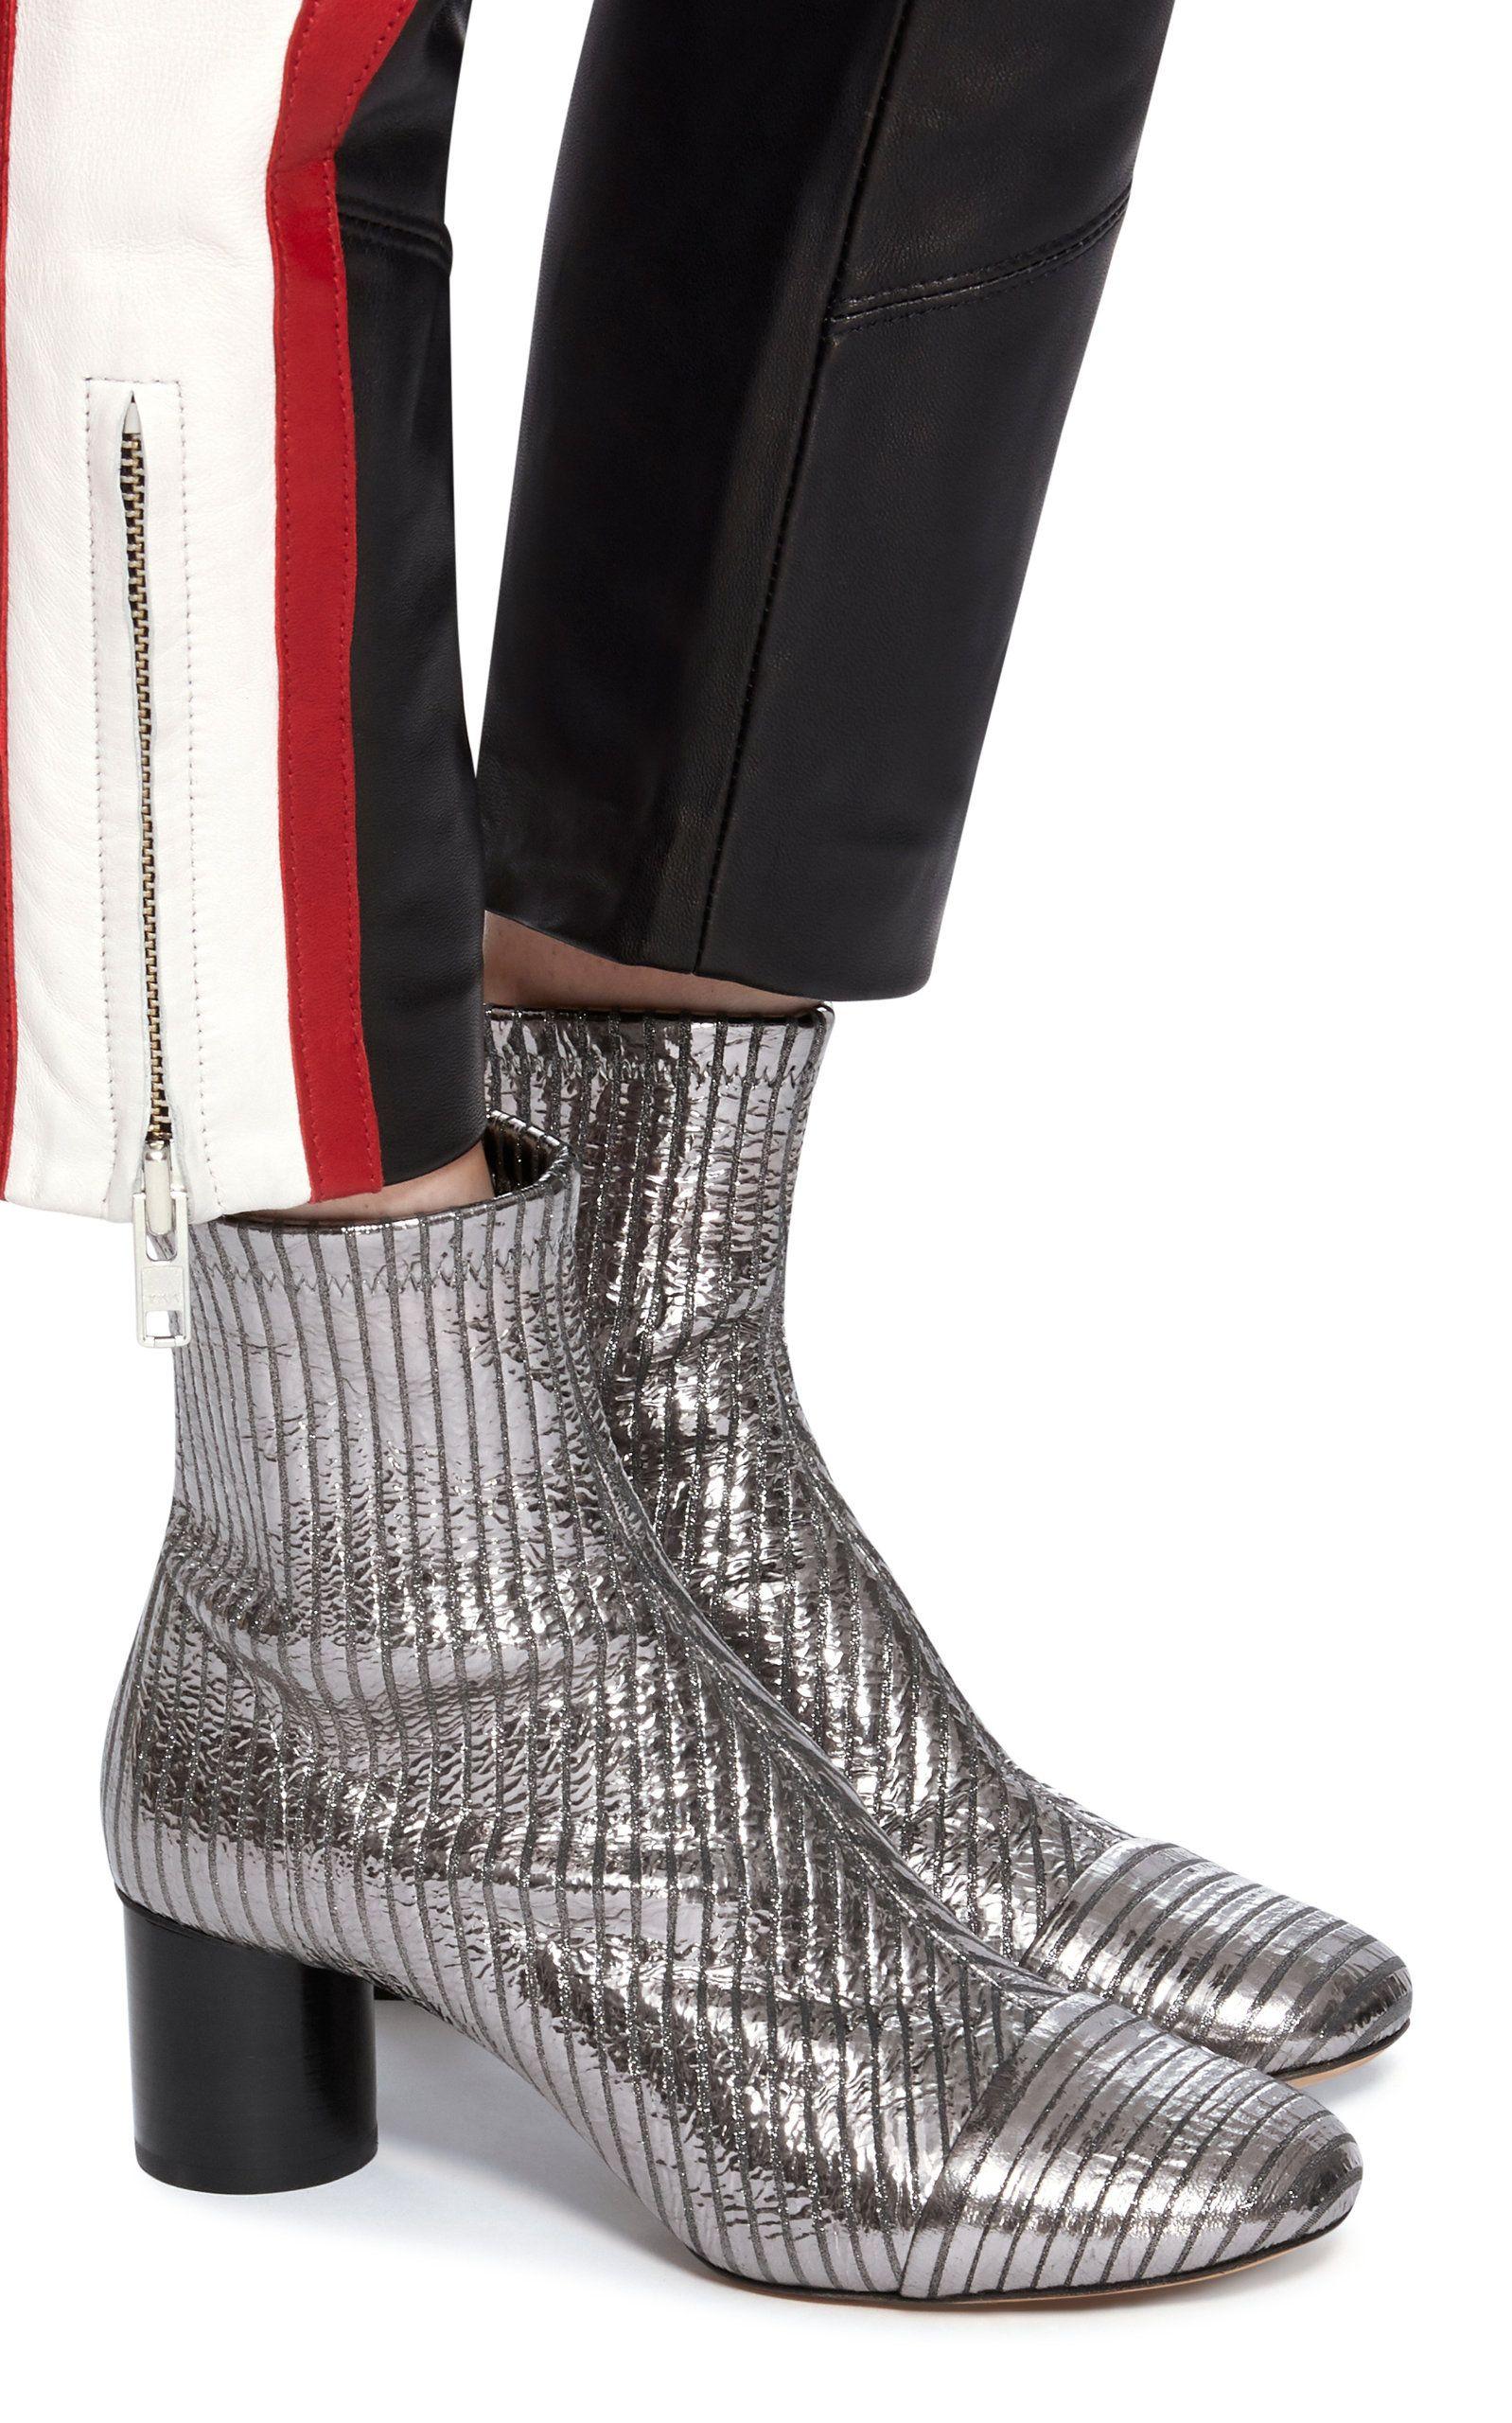 f6f5e3f28ca Isabel Marant Datsy Metallic Leather Ankle Boots Leather Ankle Boots, Metallic  Leather, Isabel Marant